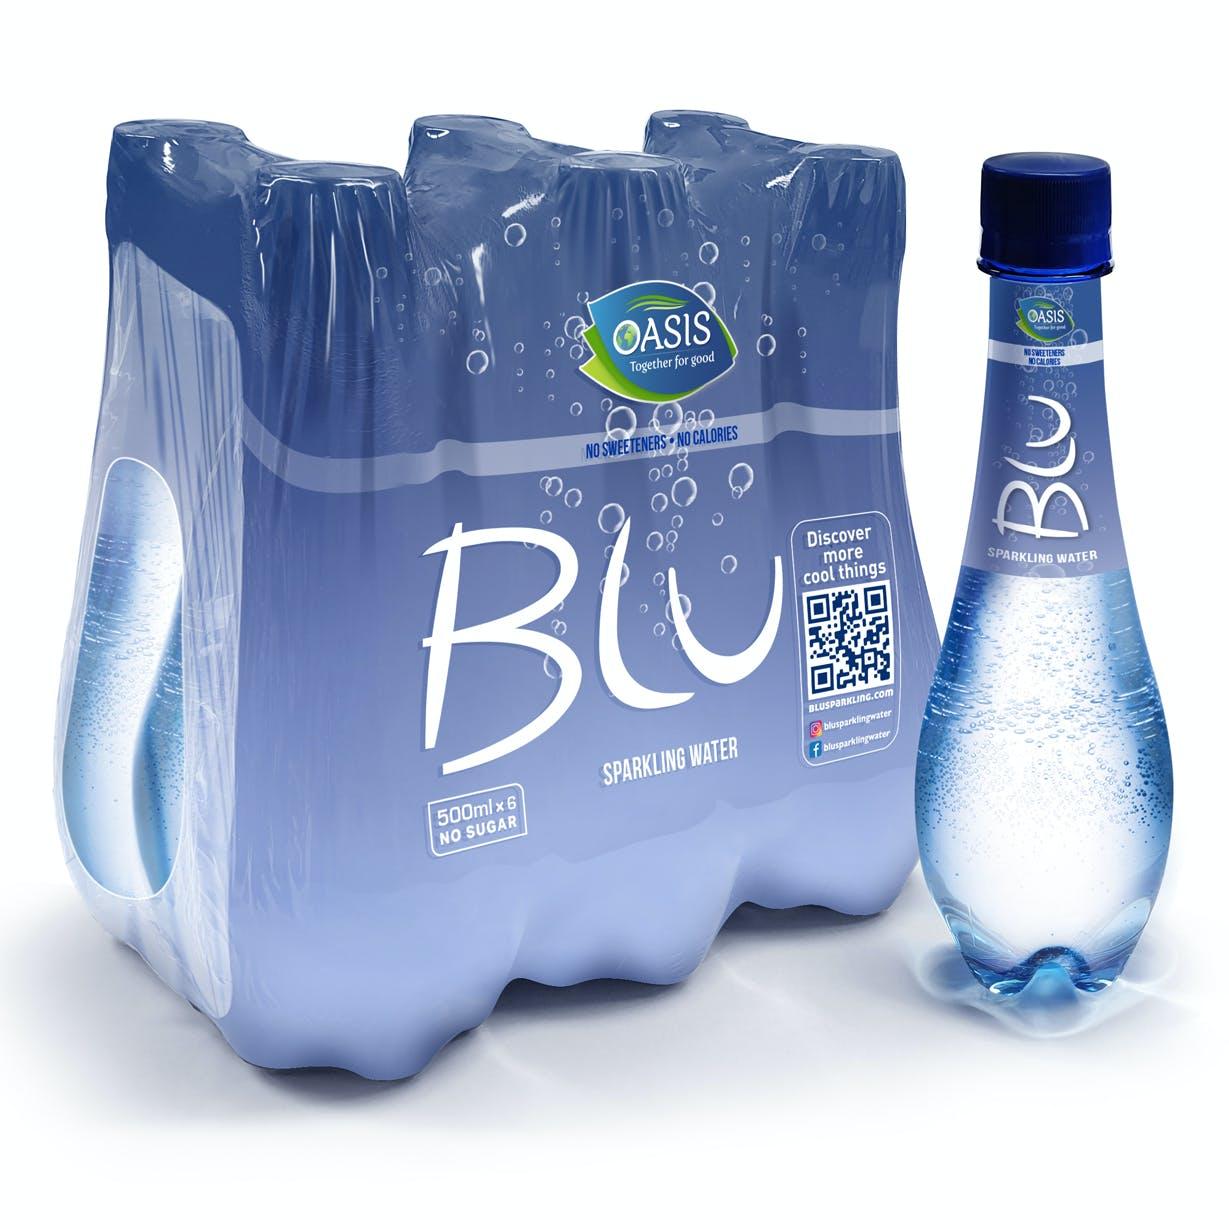 Blu Sparkling 500ml - Pack of 6